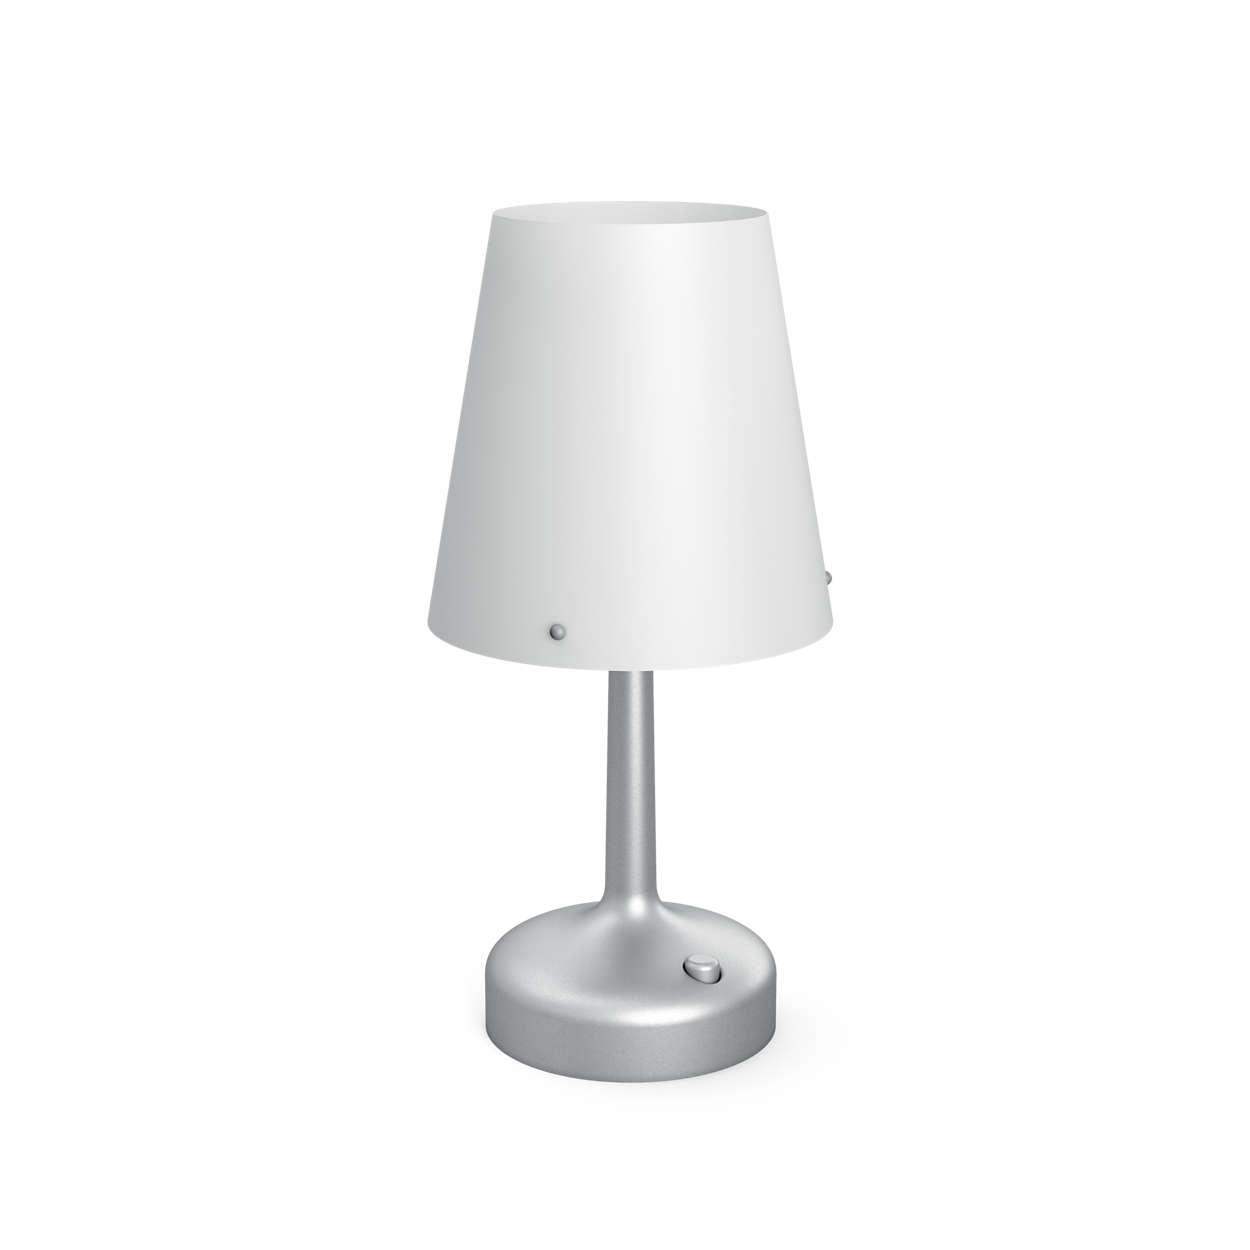 table lamp 7179648p0 philips. Black Bedroom Furniture Sets. Home Design Ideas